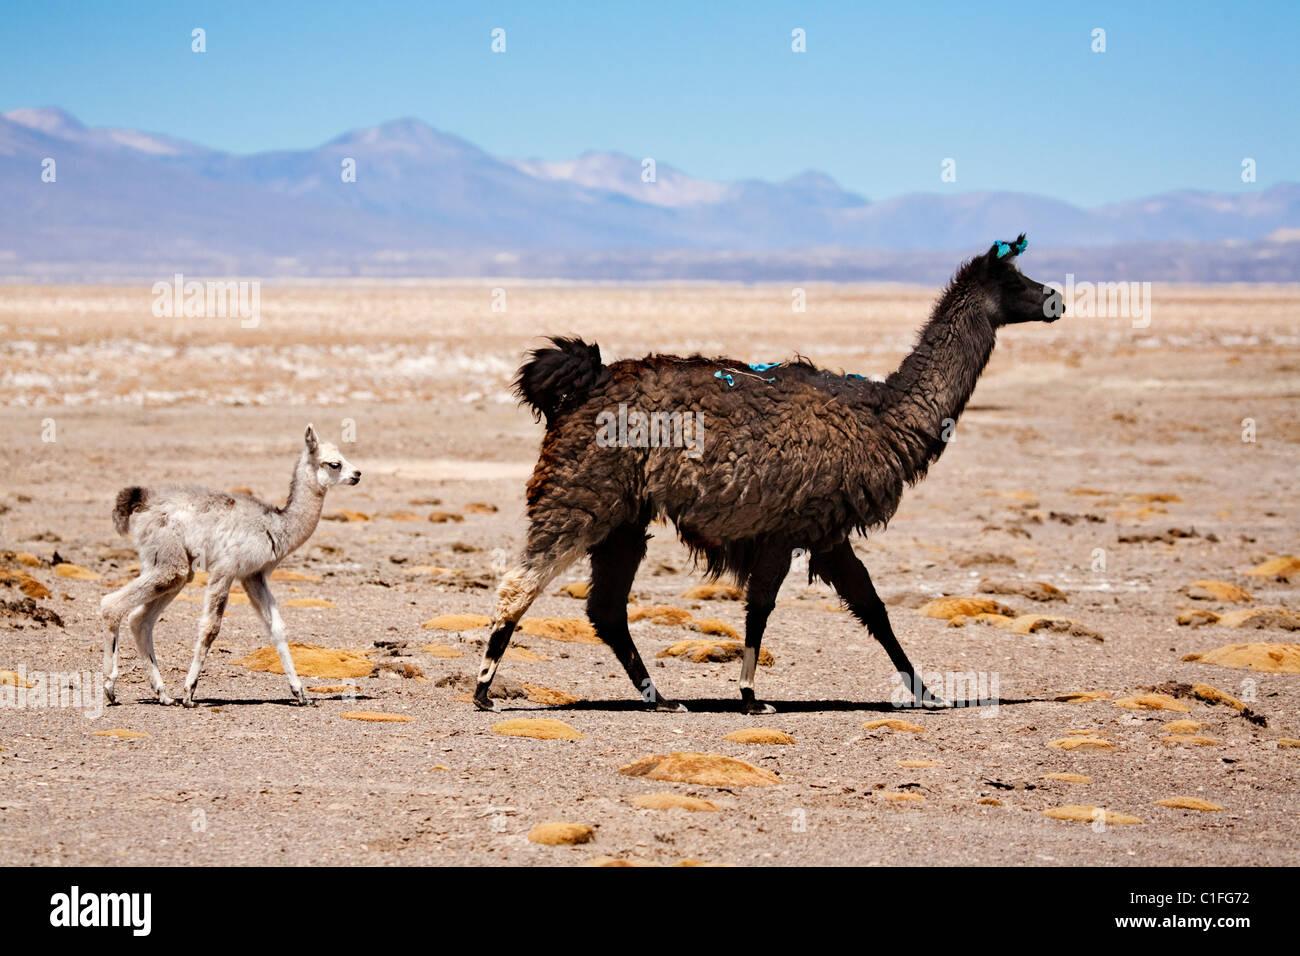 Llamas in countryside, Bolivia, South America - Stock Image